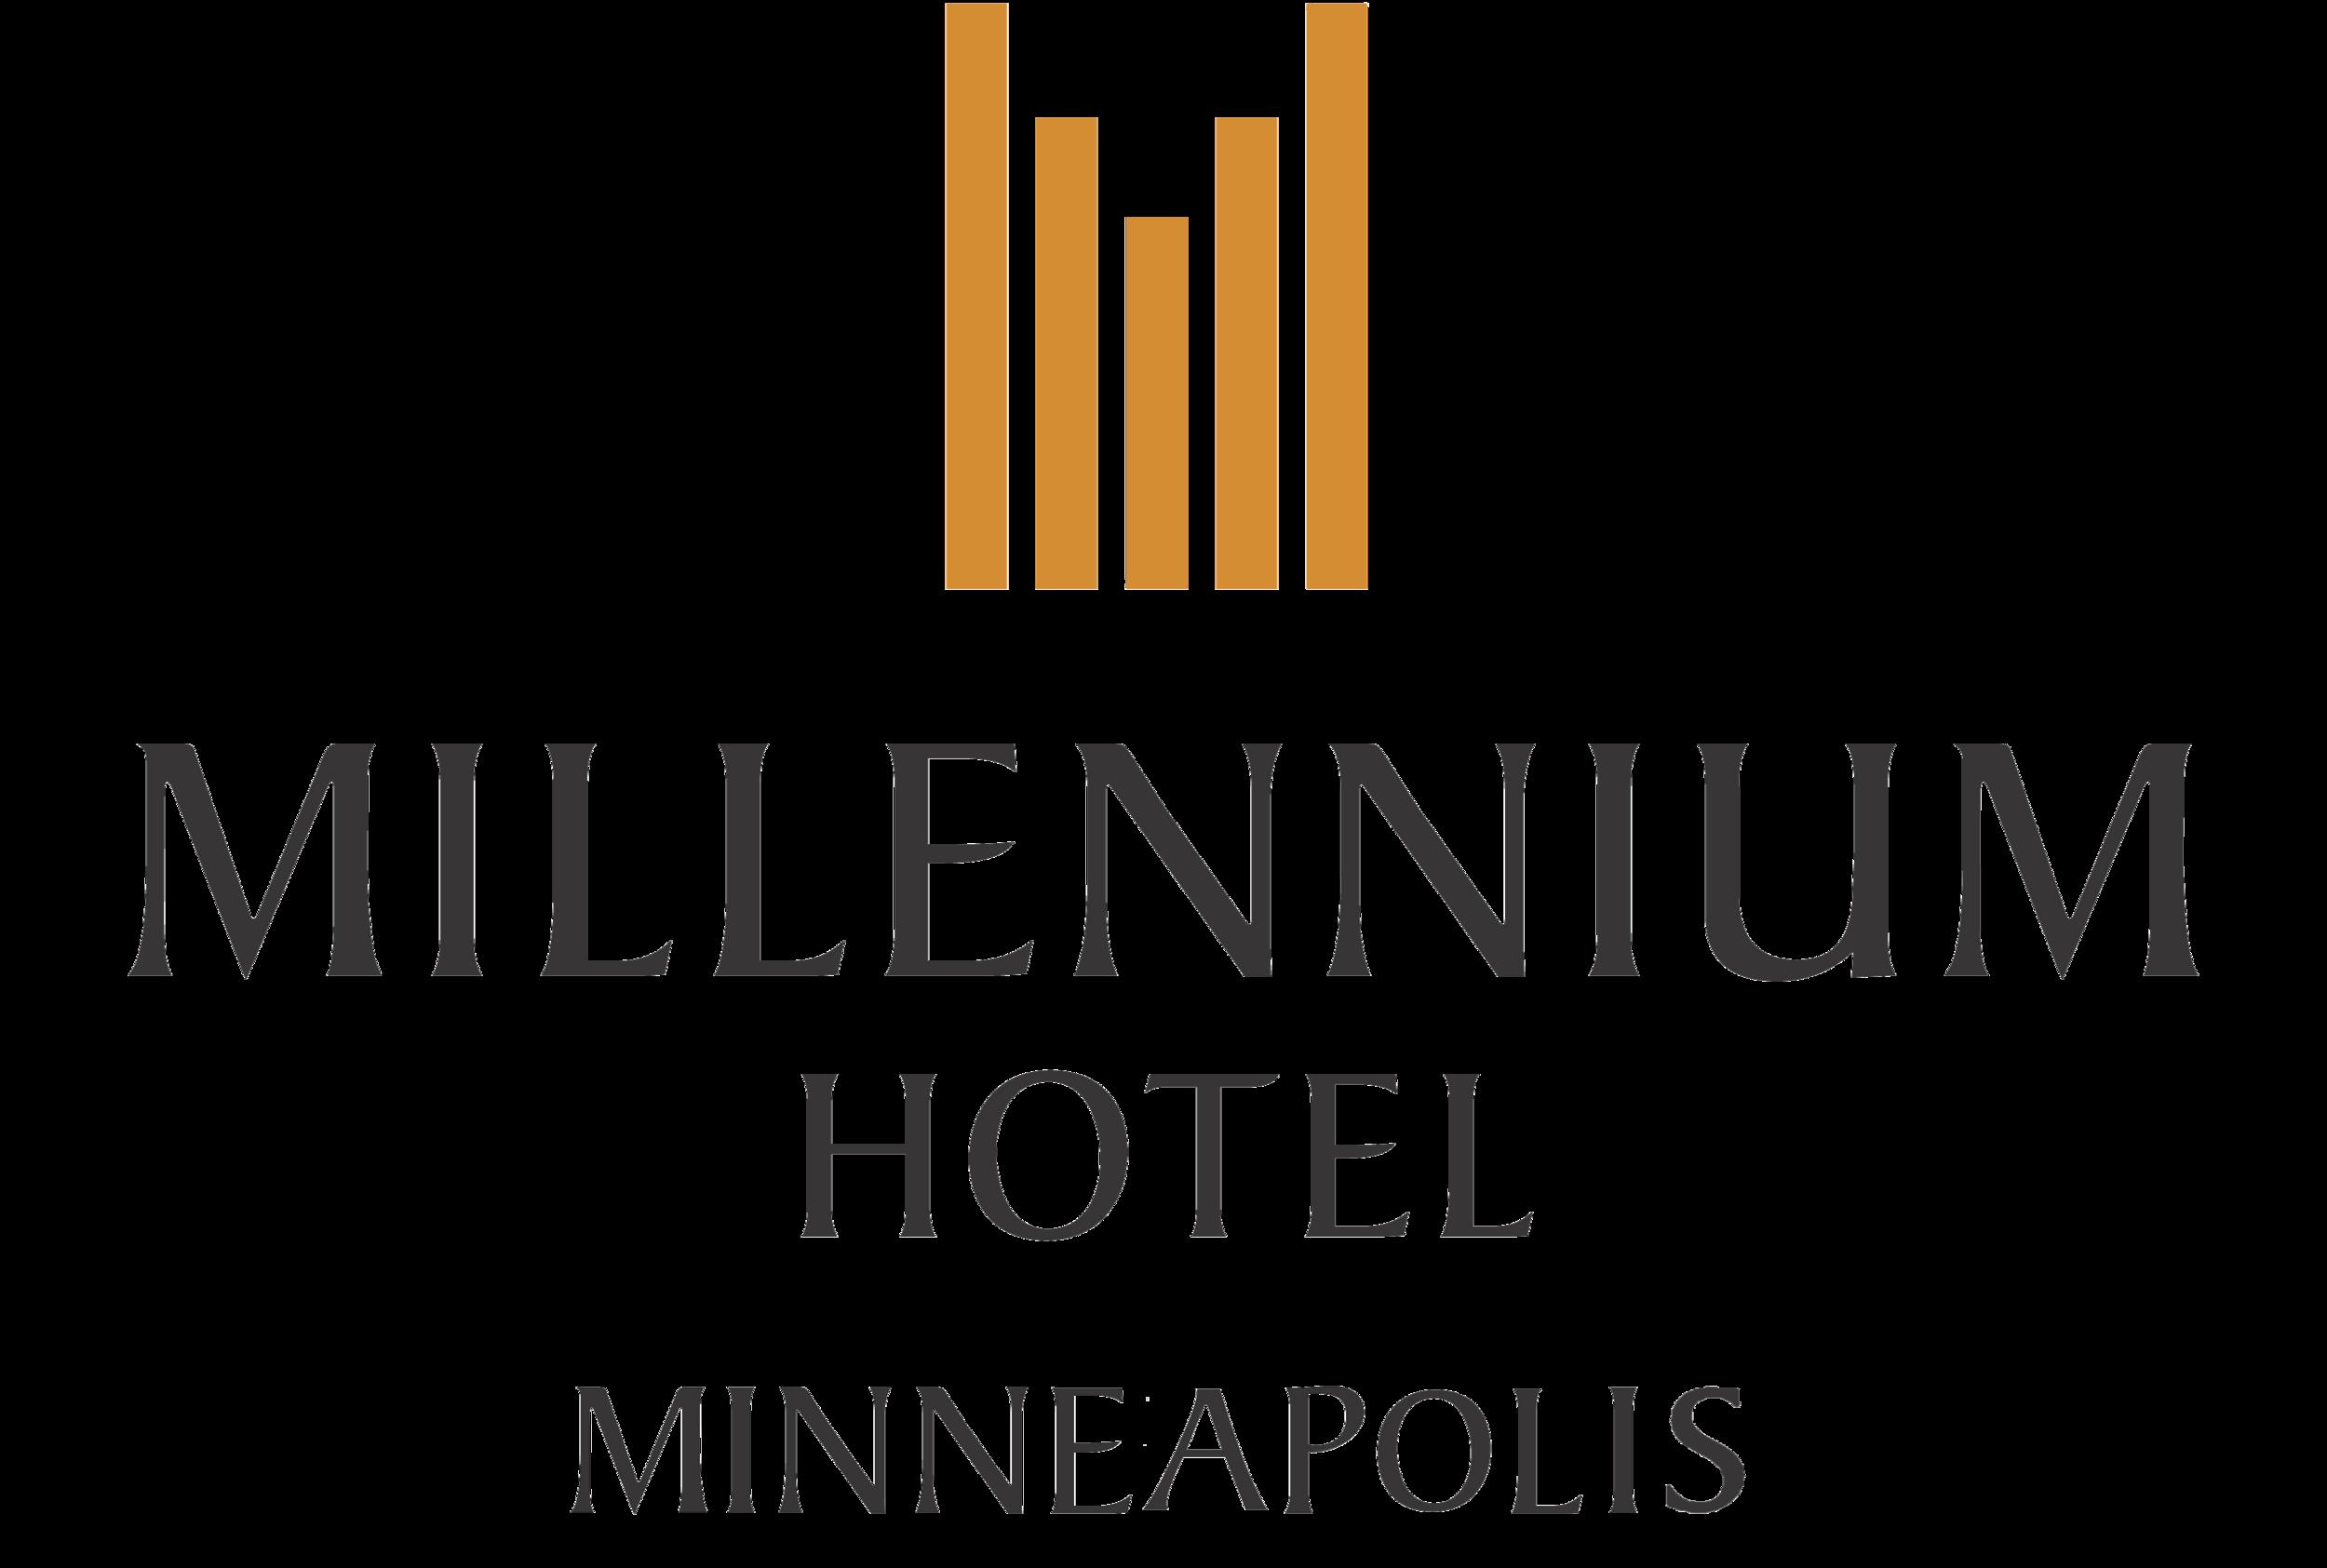 millennium-hotel.png